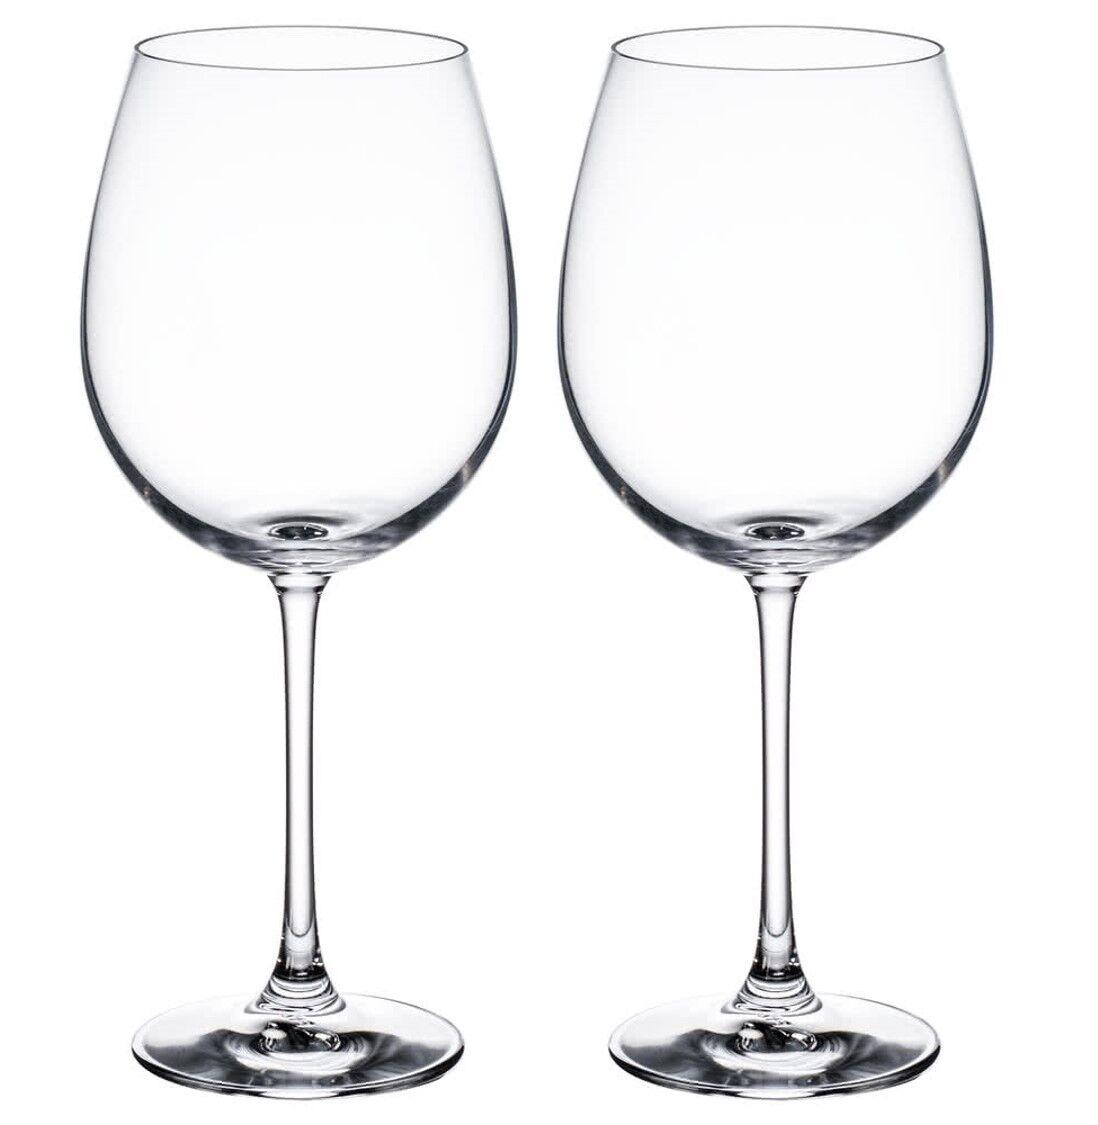 TWO (2) NACHTMANN VIVENDI 24.5 OZ FASHIONABLE RED WINE GLASS GLASSES GERMAN MADE